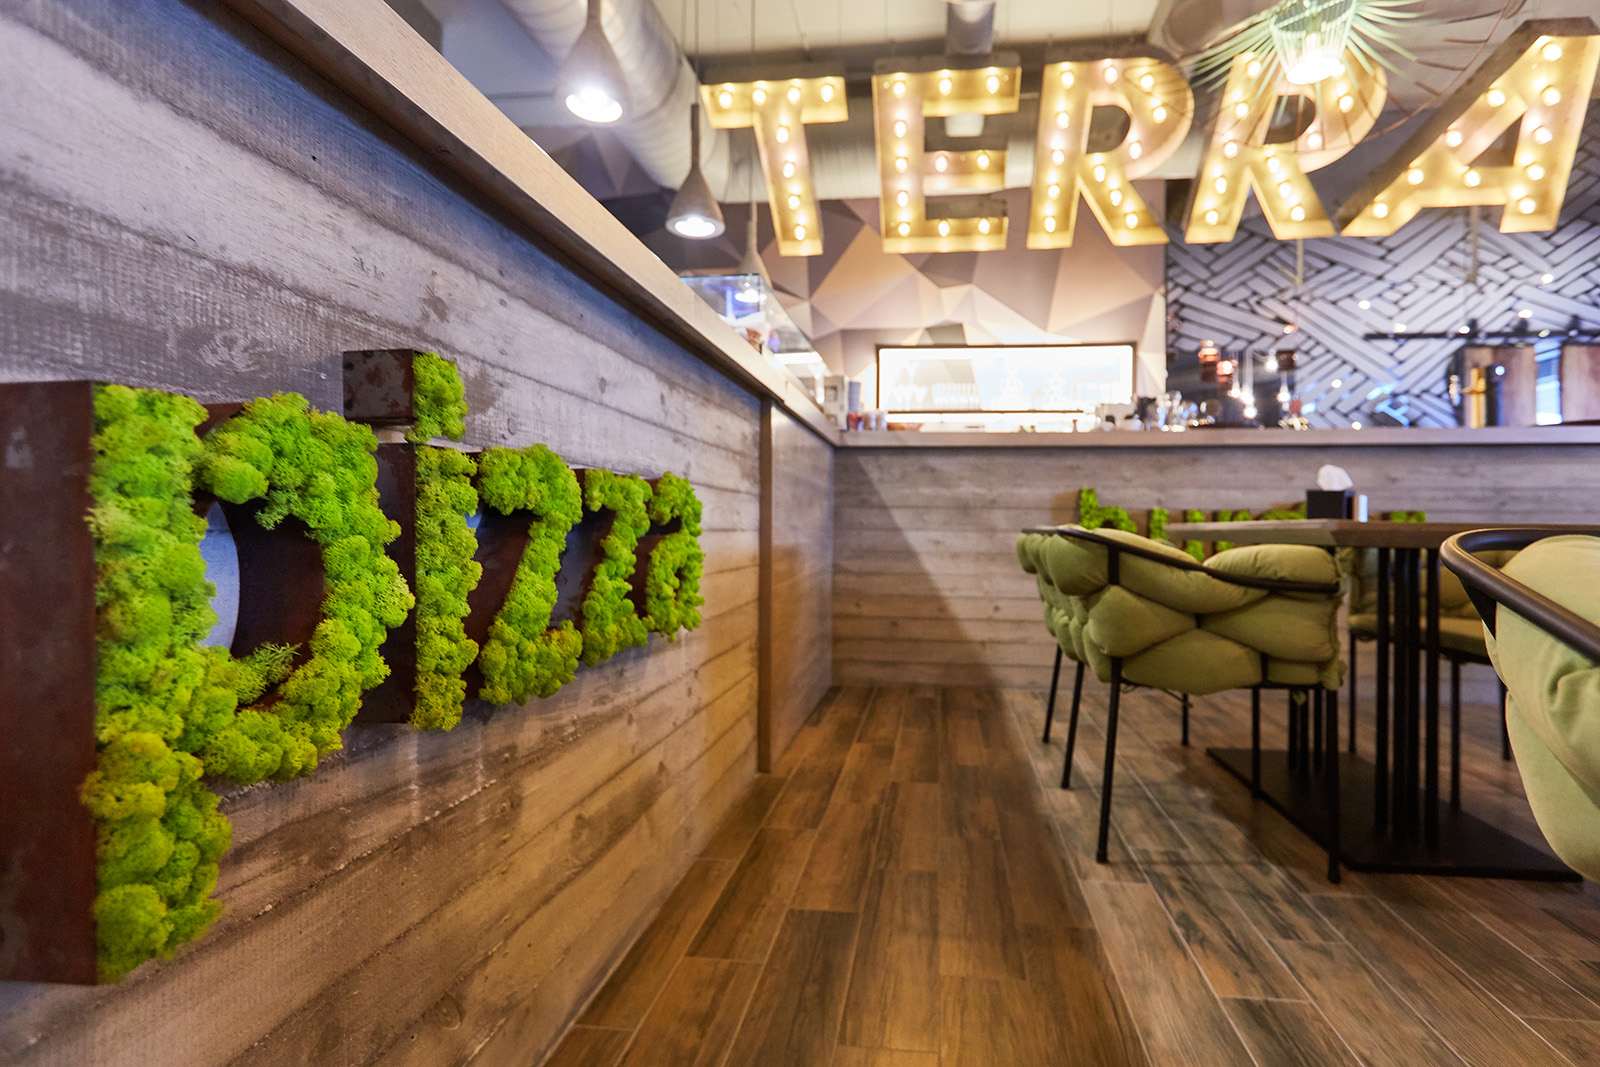 Terra pizza - Лебяжий